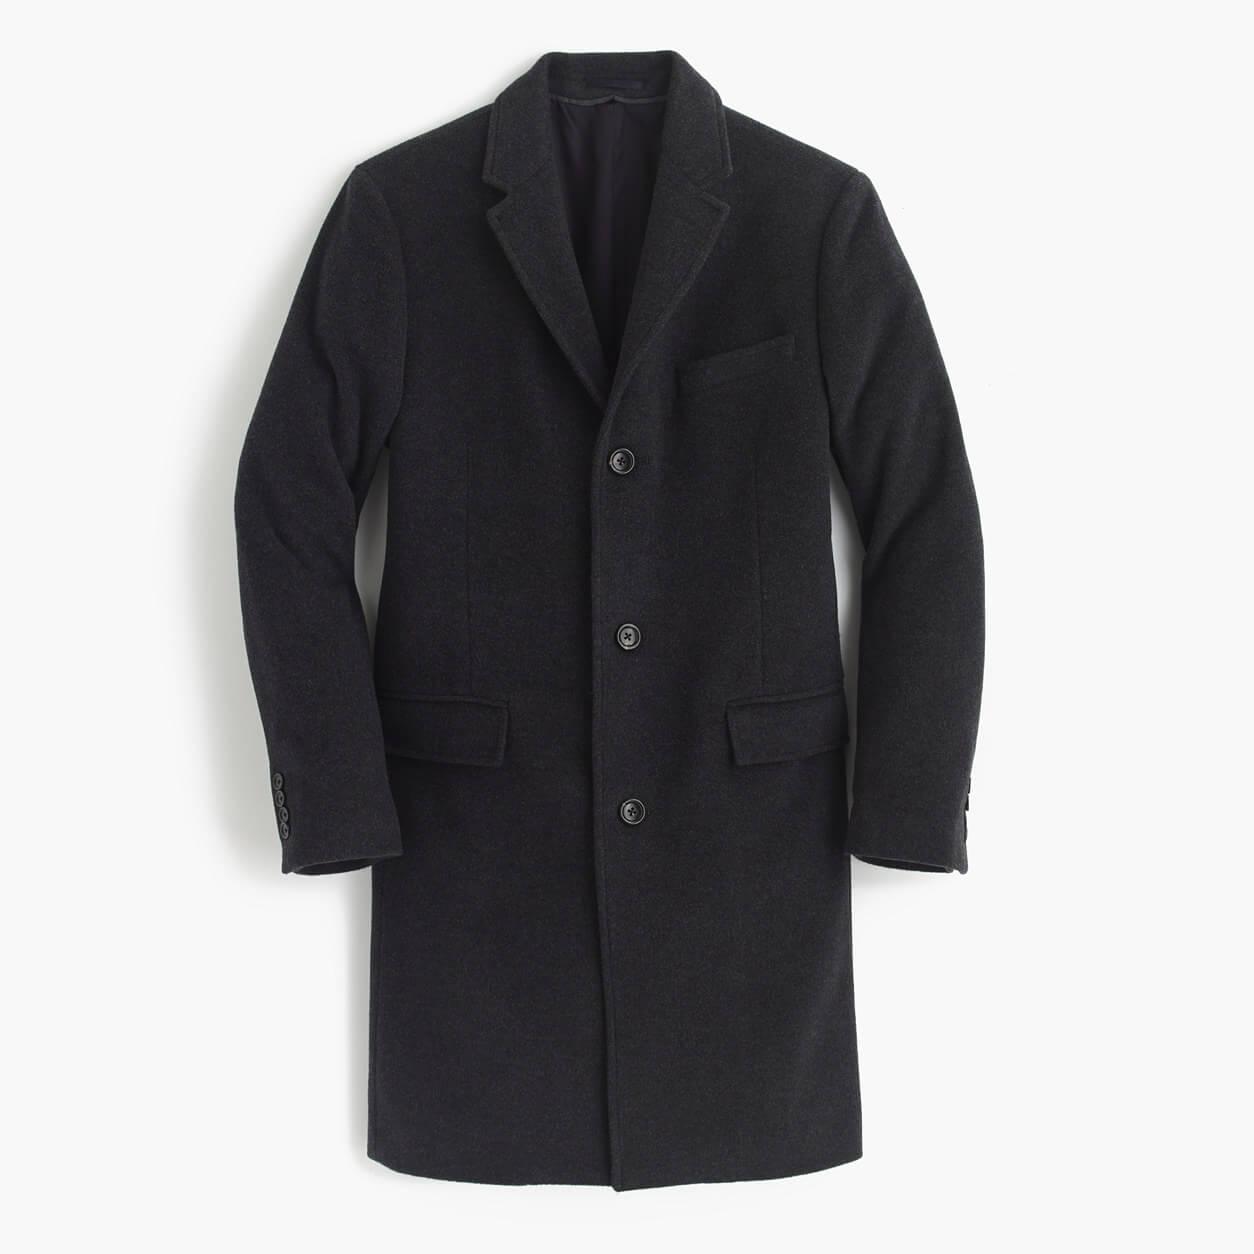 jcrew-topcoat